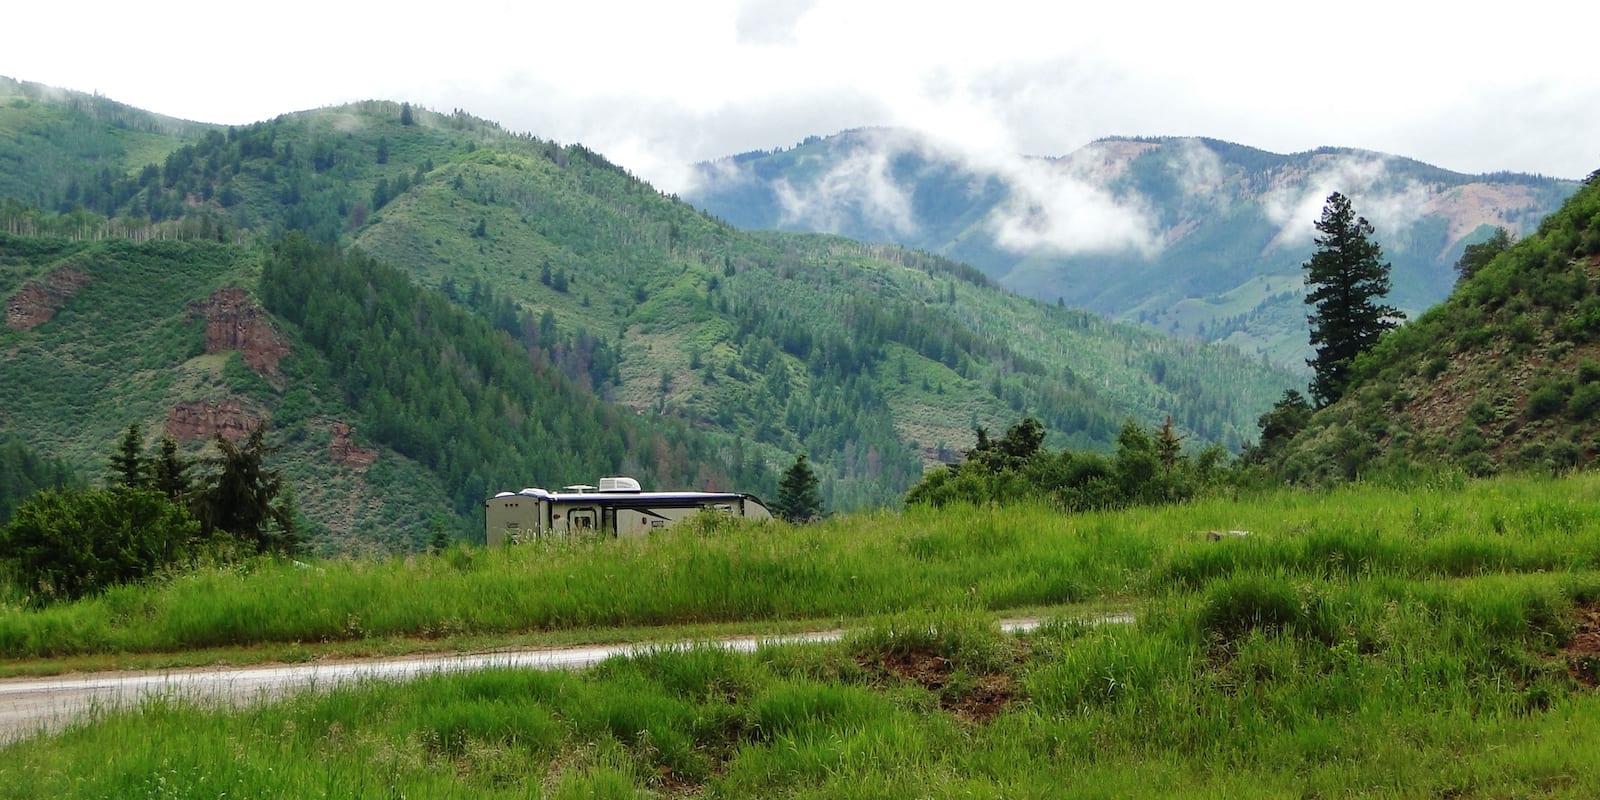 RV Camping Sylvan Lake State Park Eagle CO